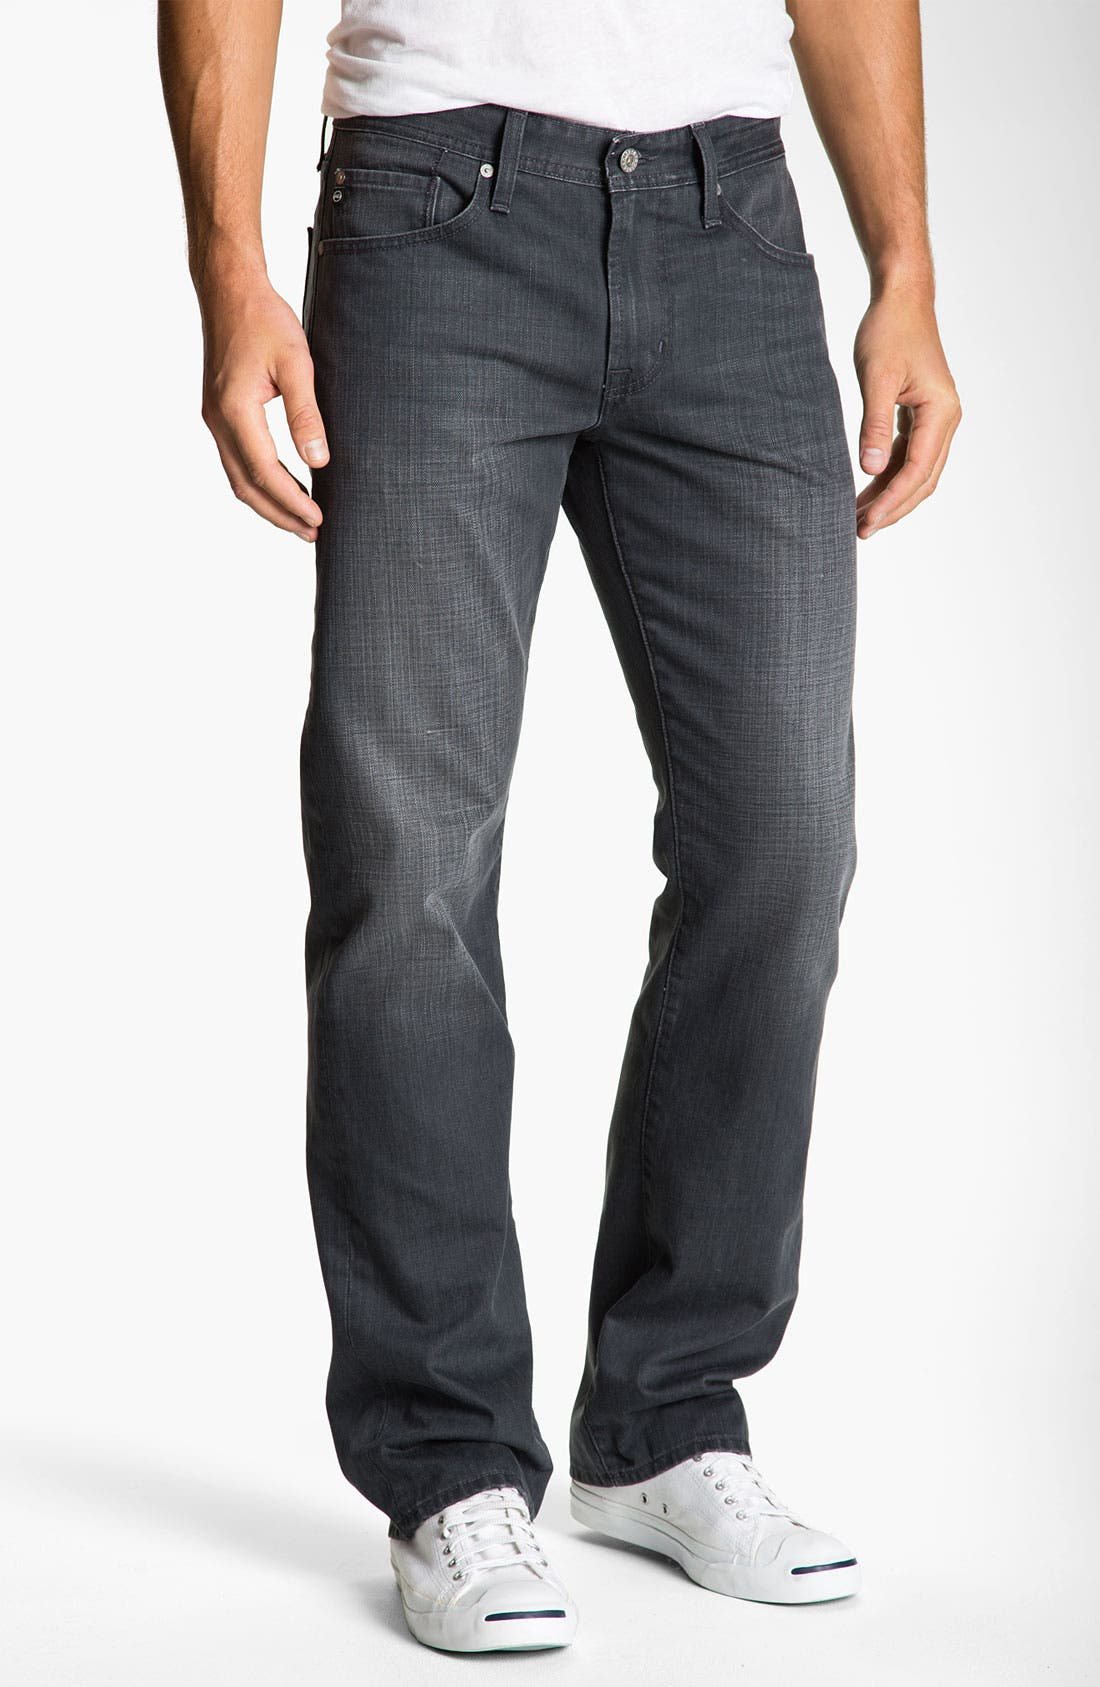 Alternate Image 1 Selected - AG Jeans 'Protégé' Straight Leg Jeans (Cooper)